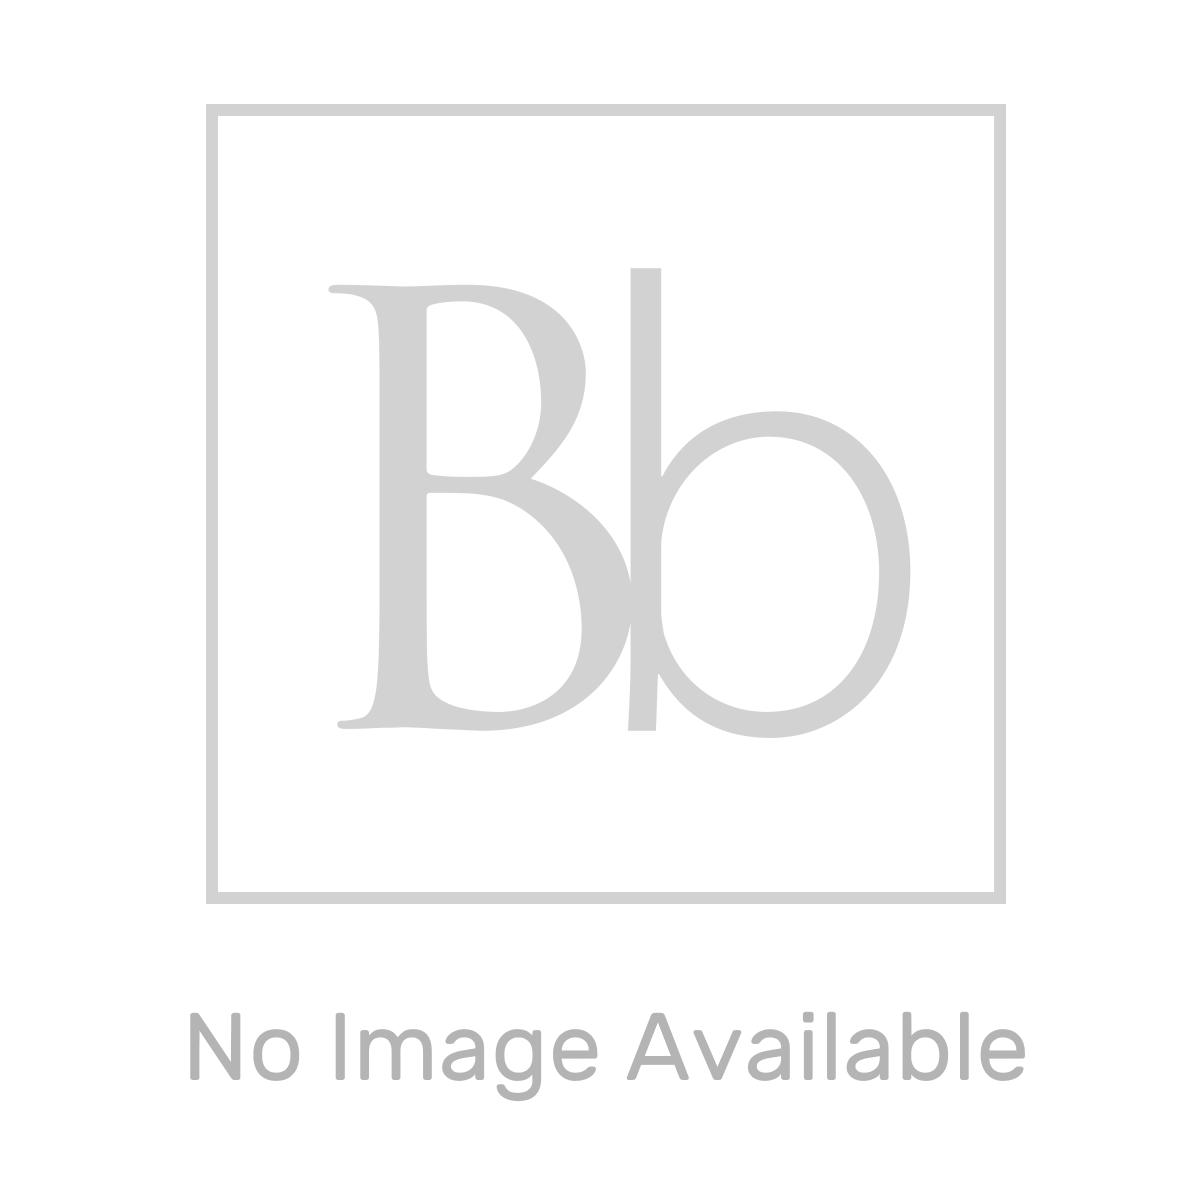 RAK Moon Black Freestanding Shower Bath Mixer Tap Measurements